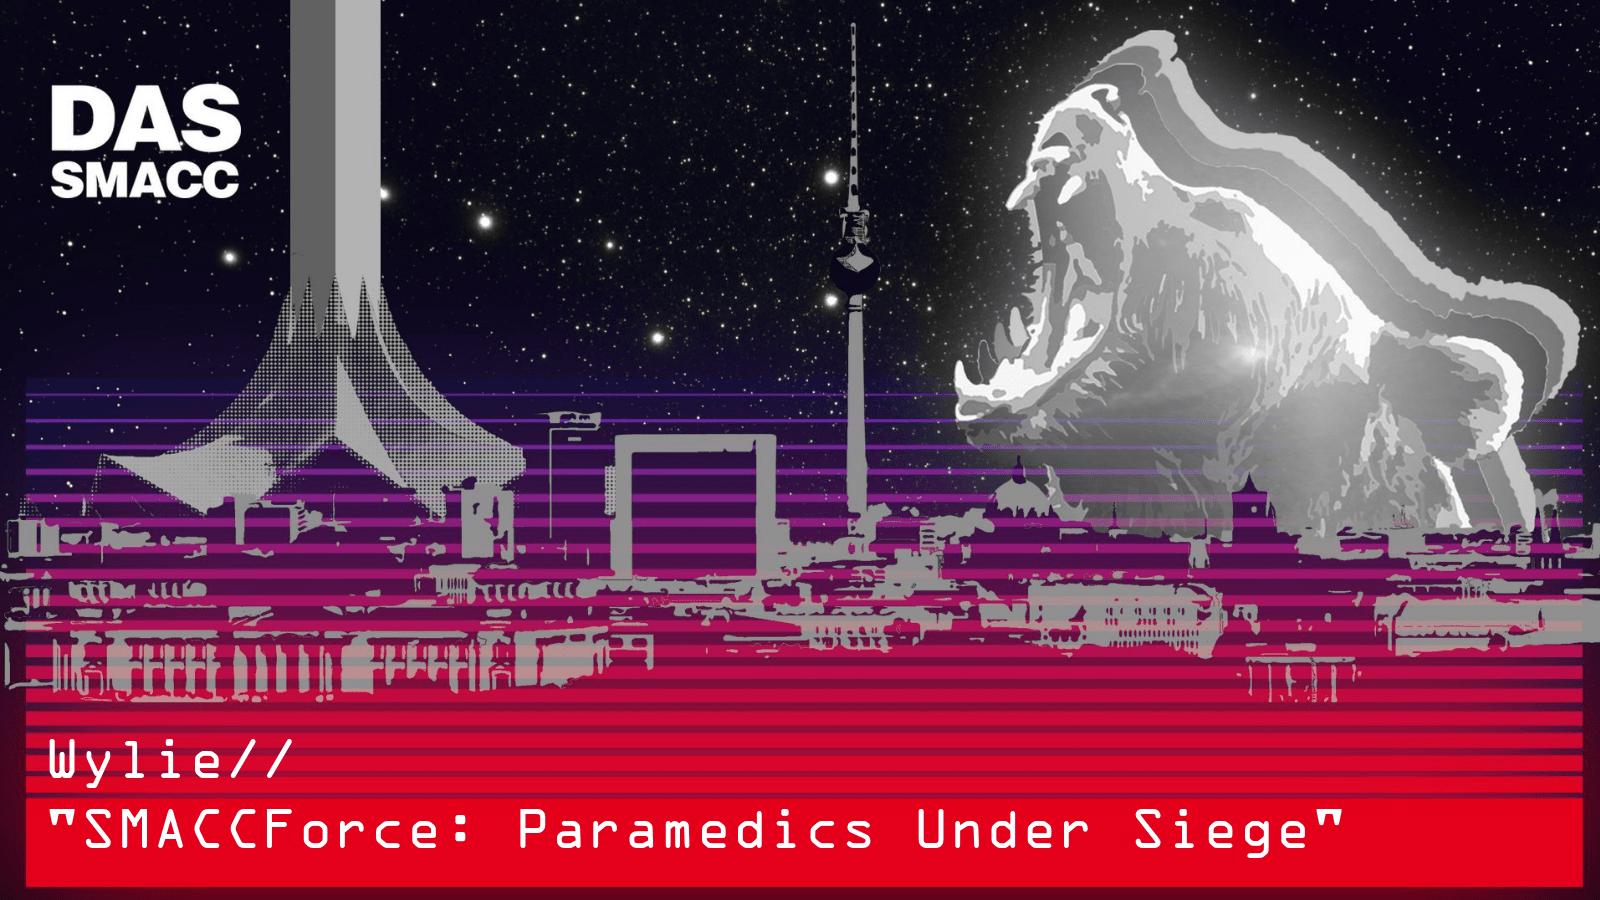 Paramedics Under Siege